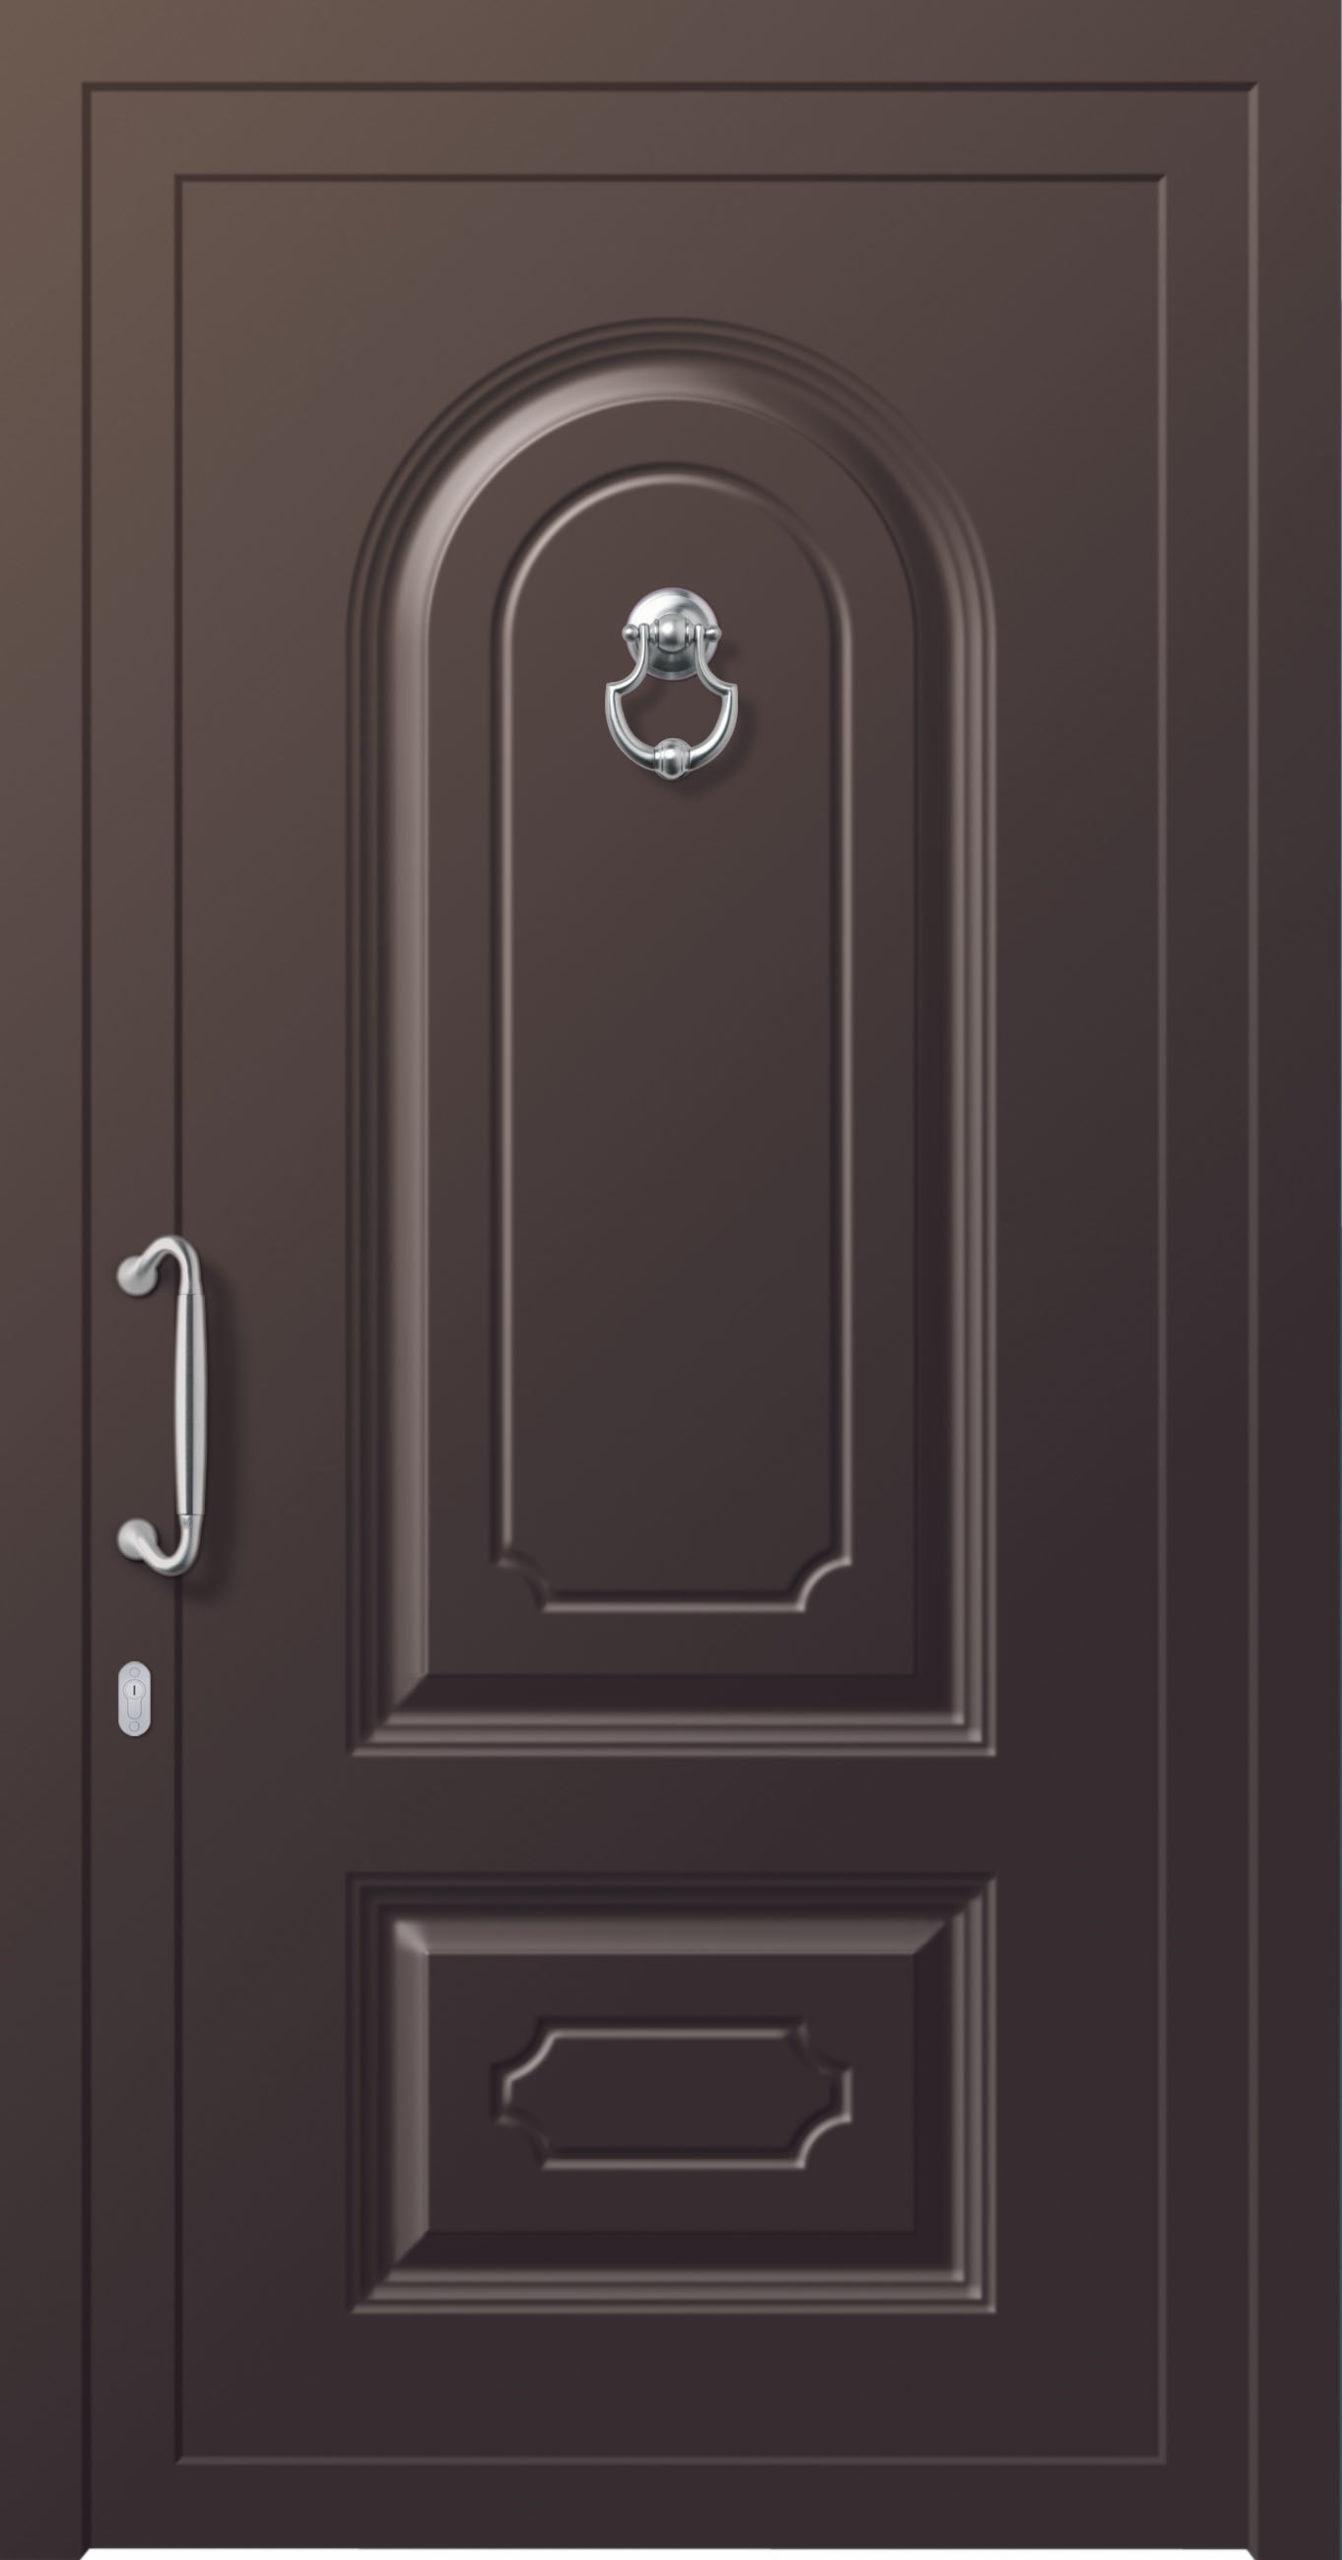 Entry Doors Linea Classica 87